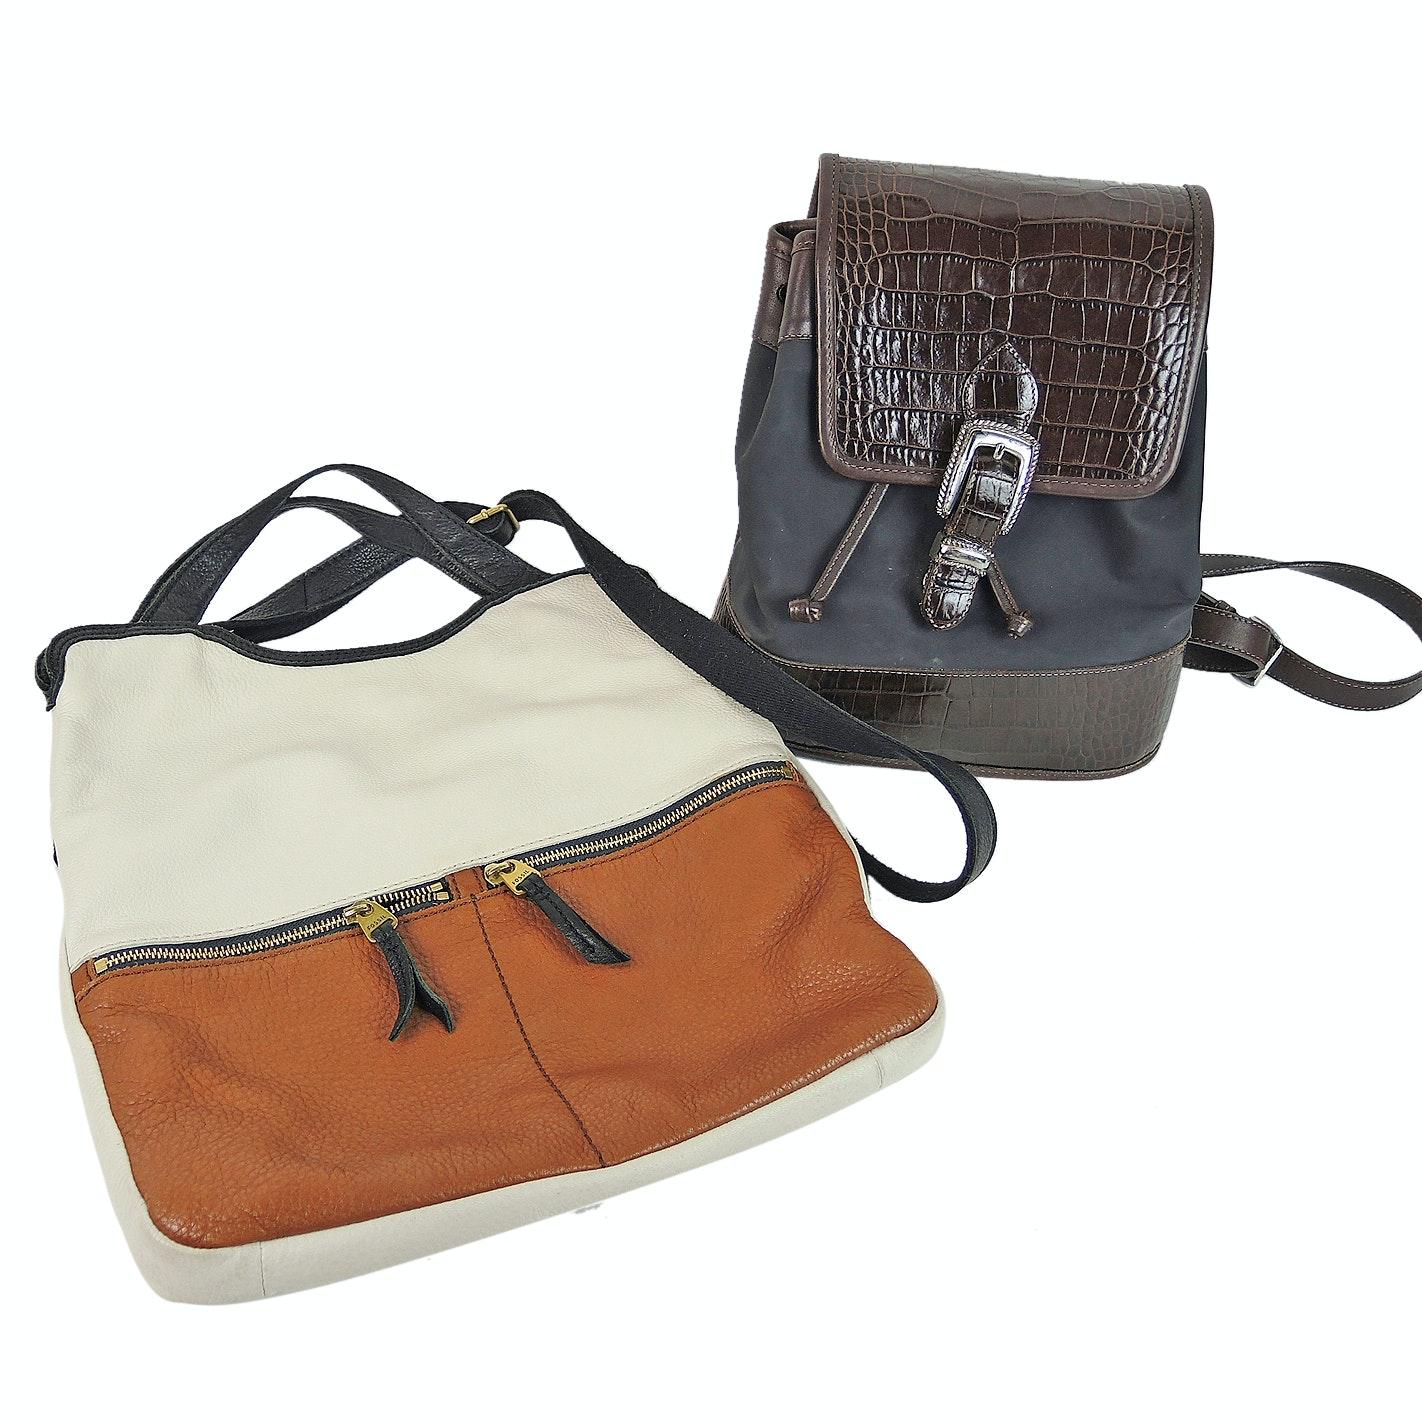 Brighton Croc Embossed Leather Trimmed Backpack and Fossil Leather Shoulder Bag